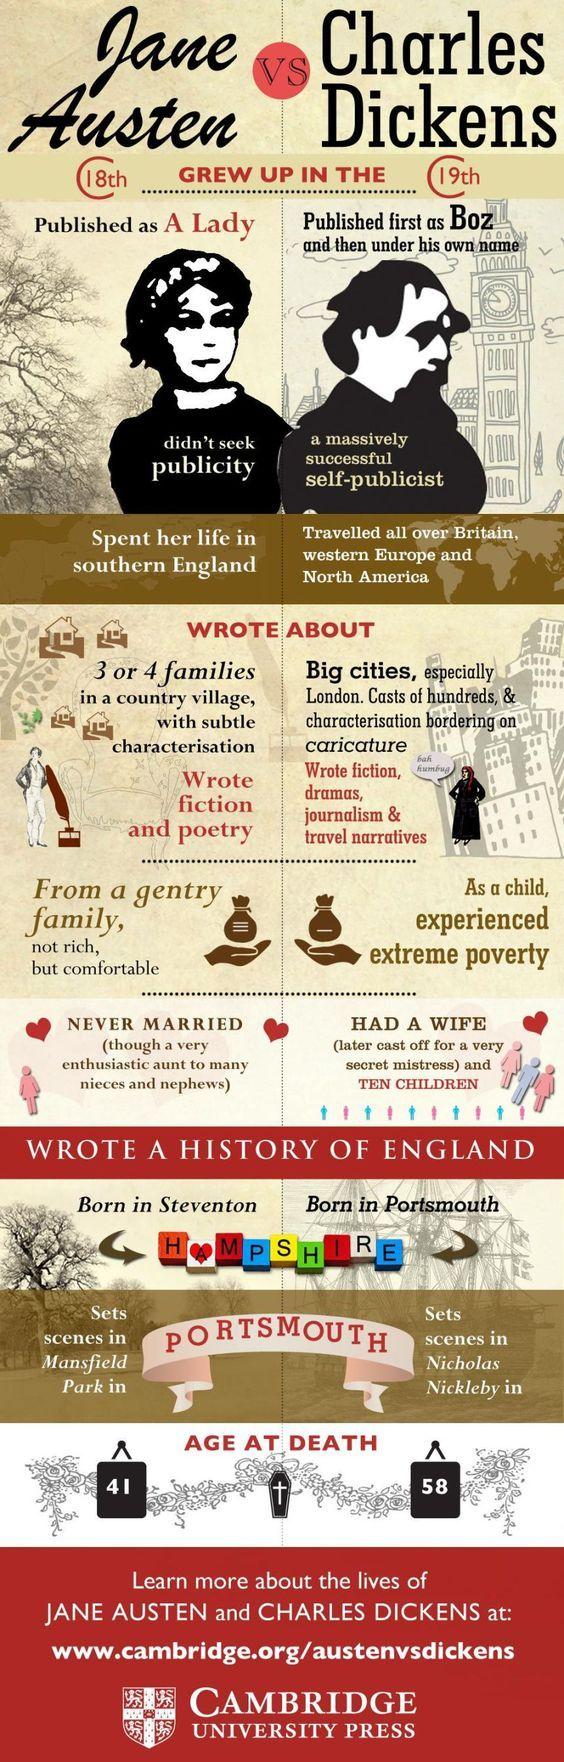 Jane Austen vs Charles Dickens